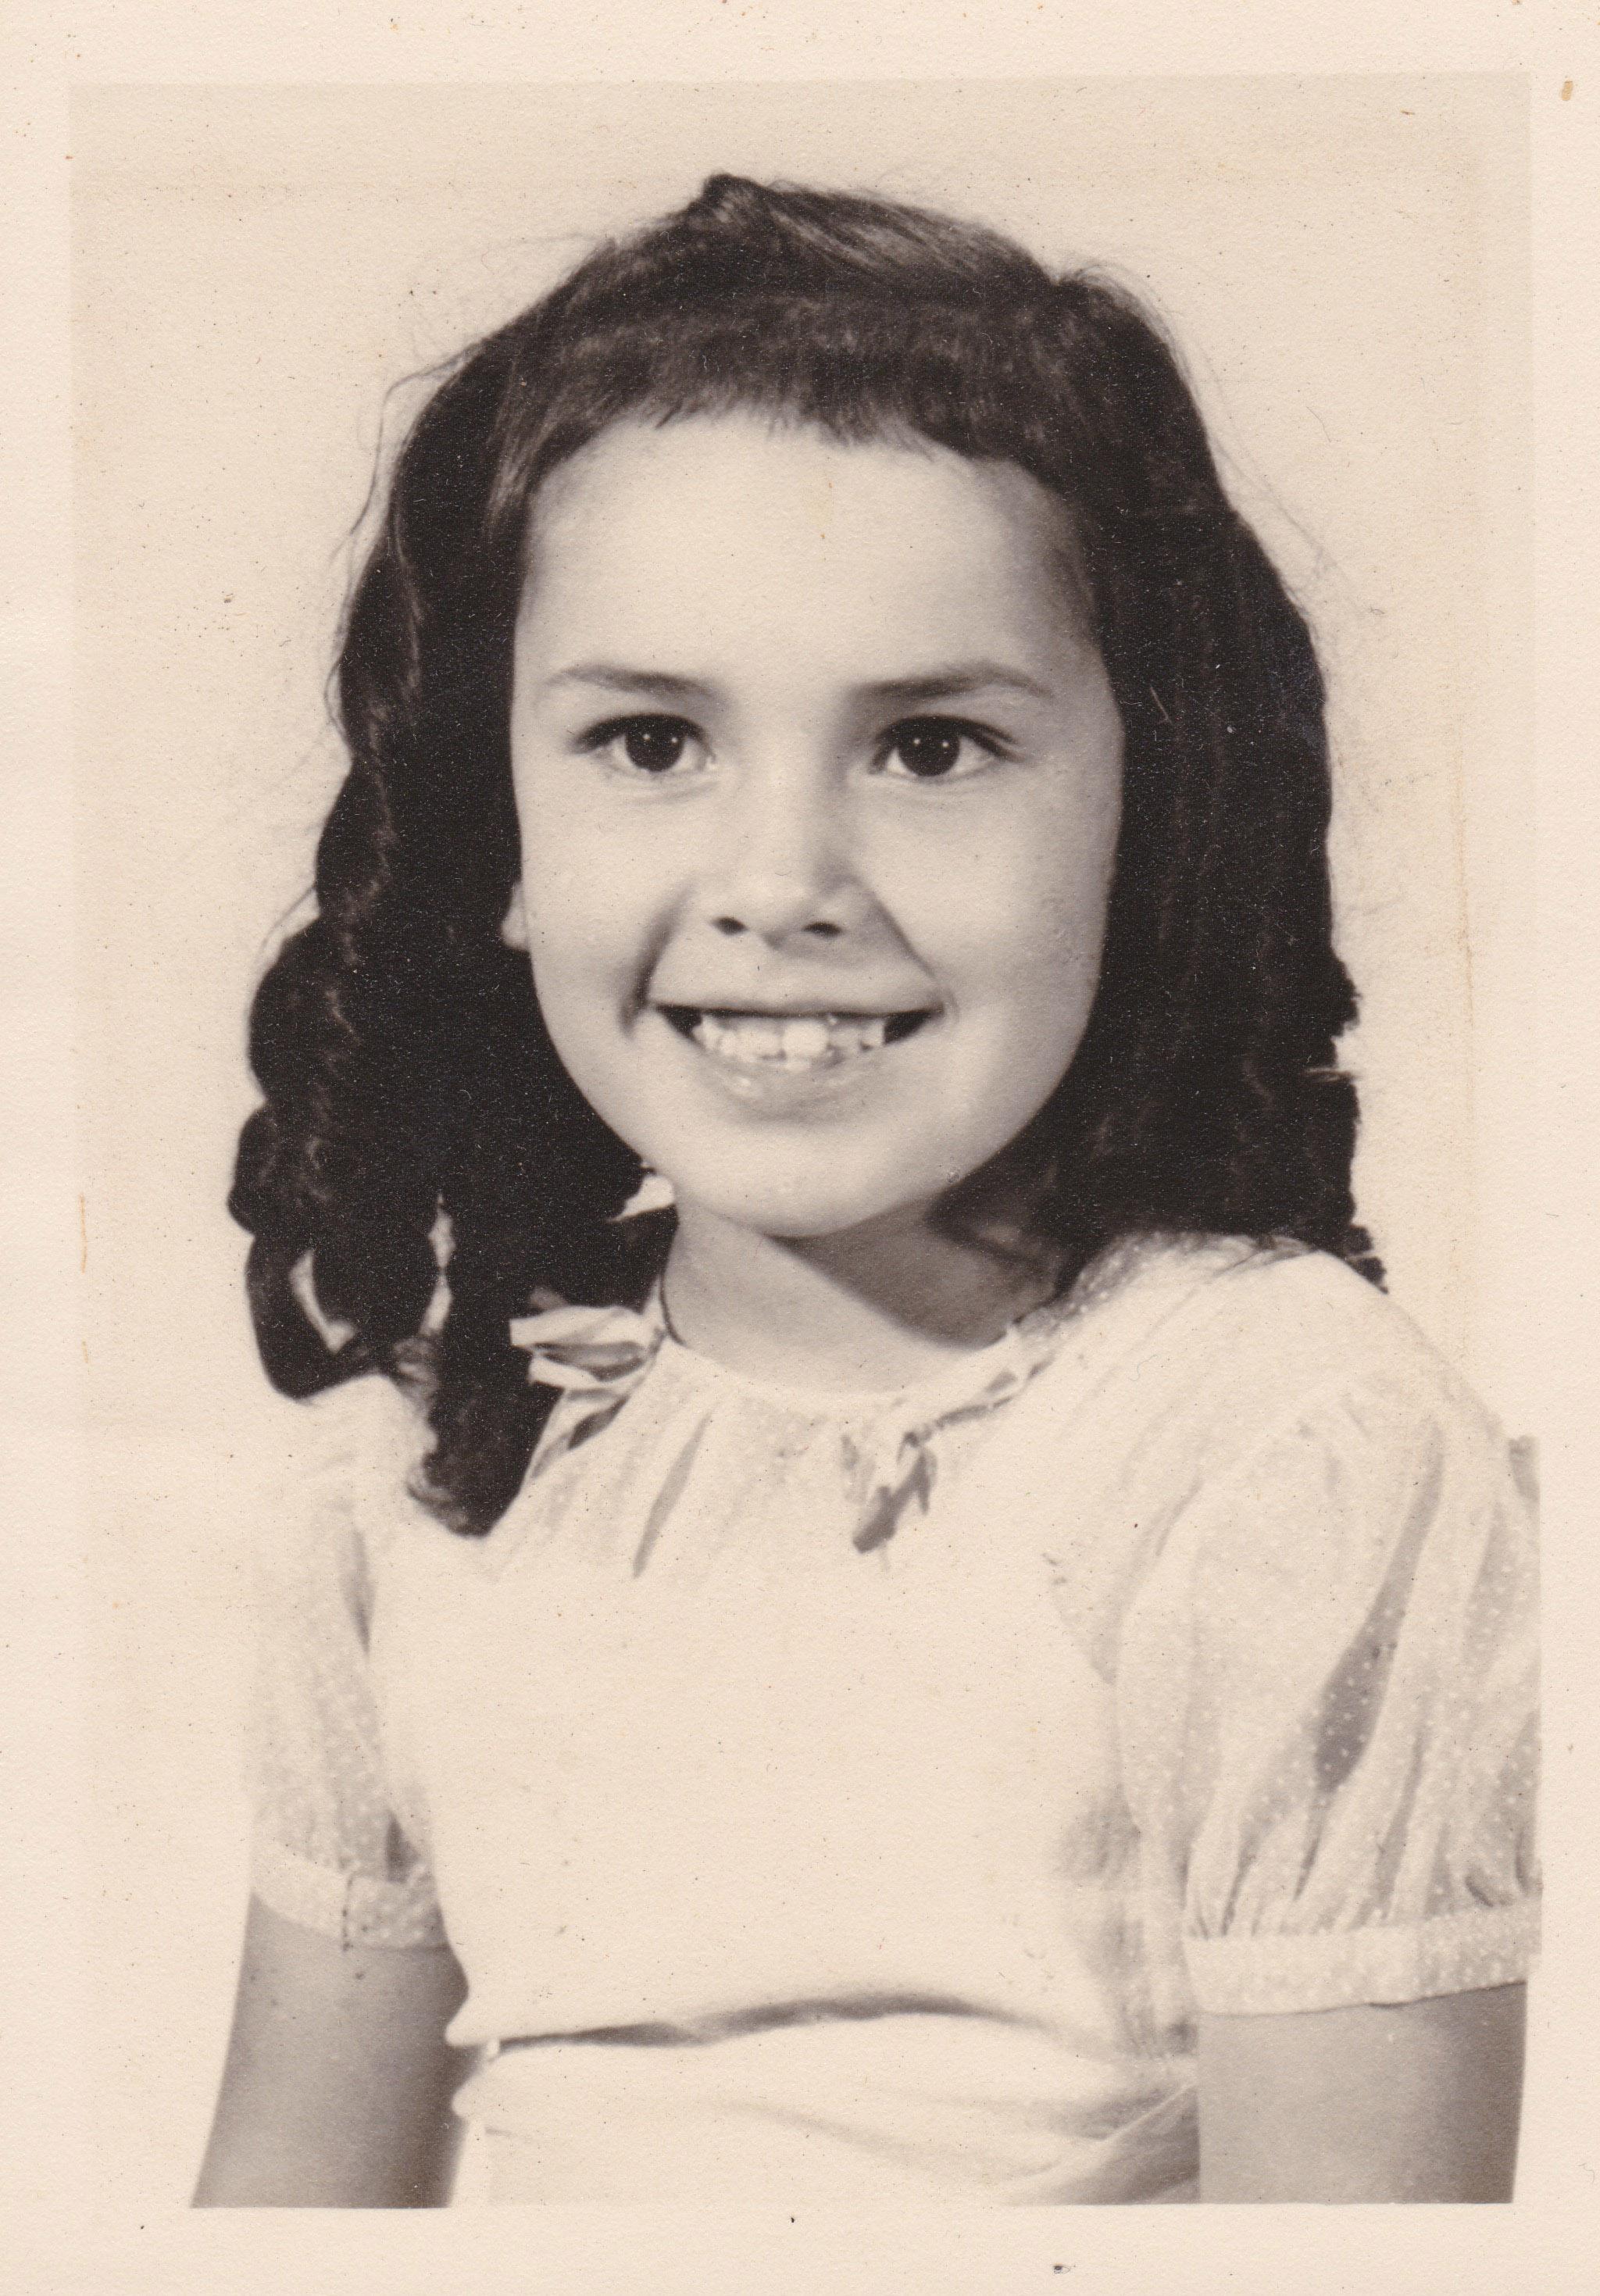 Sandy - Age 11